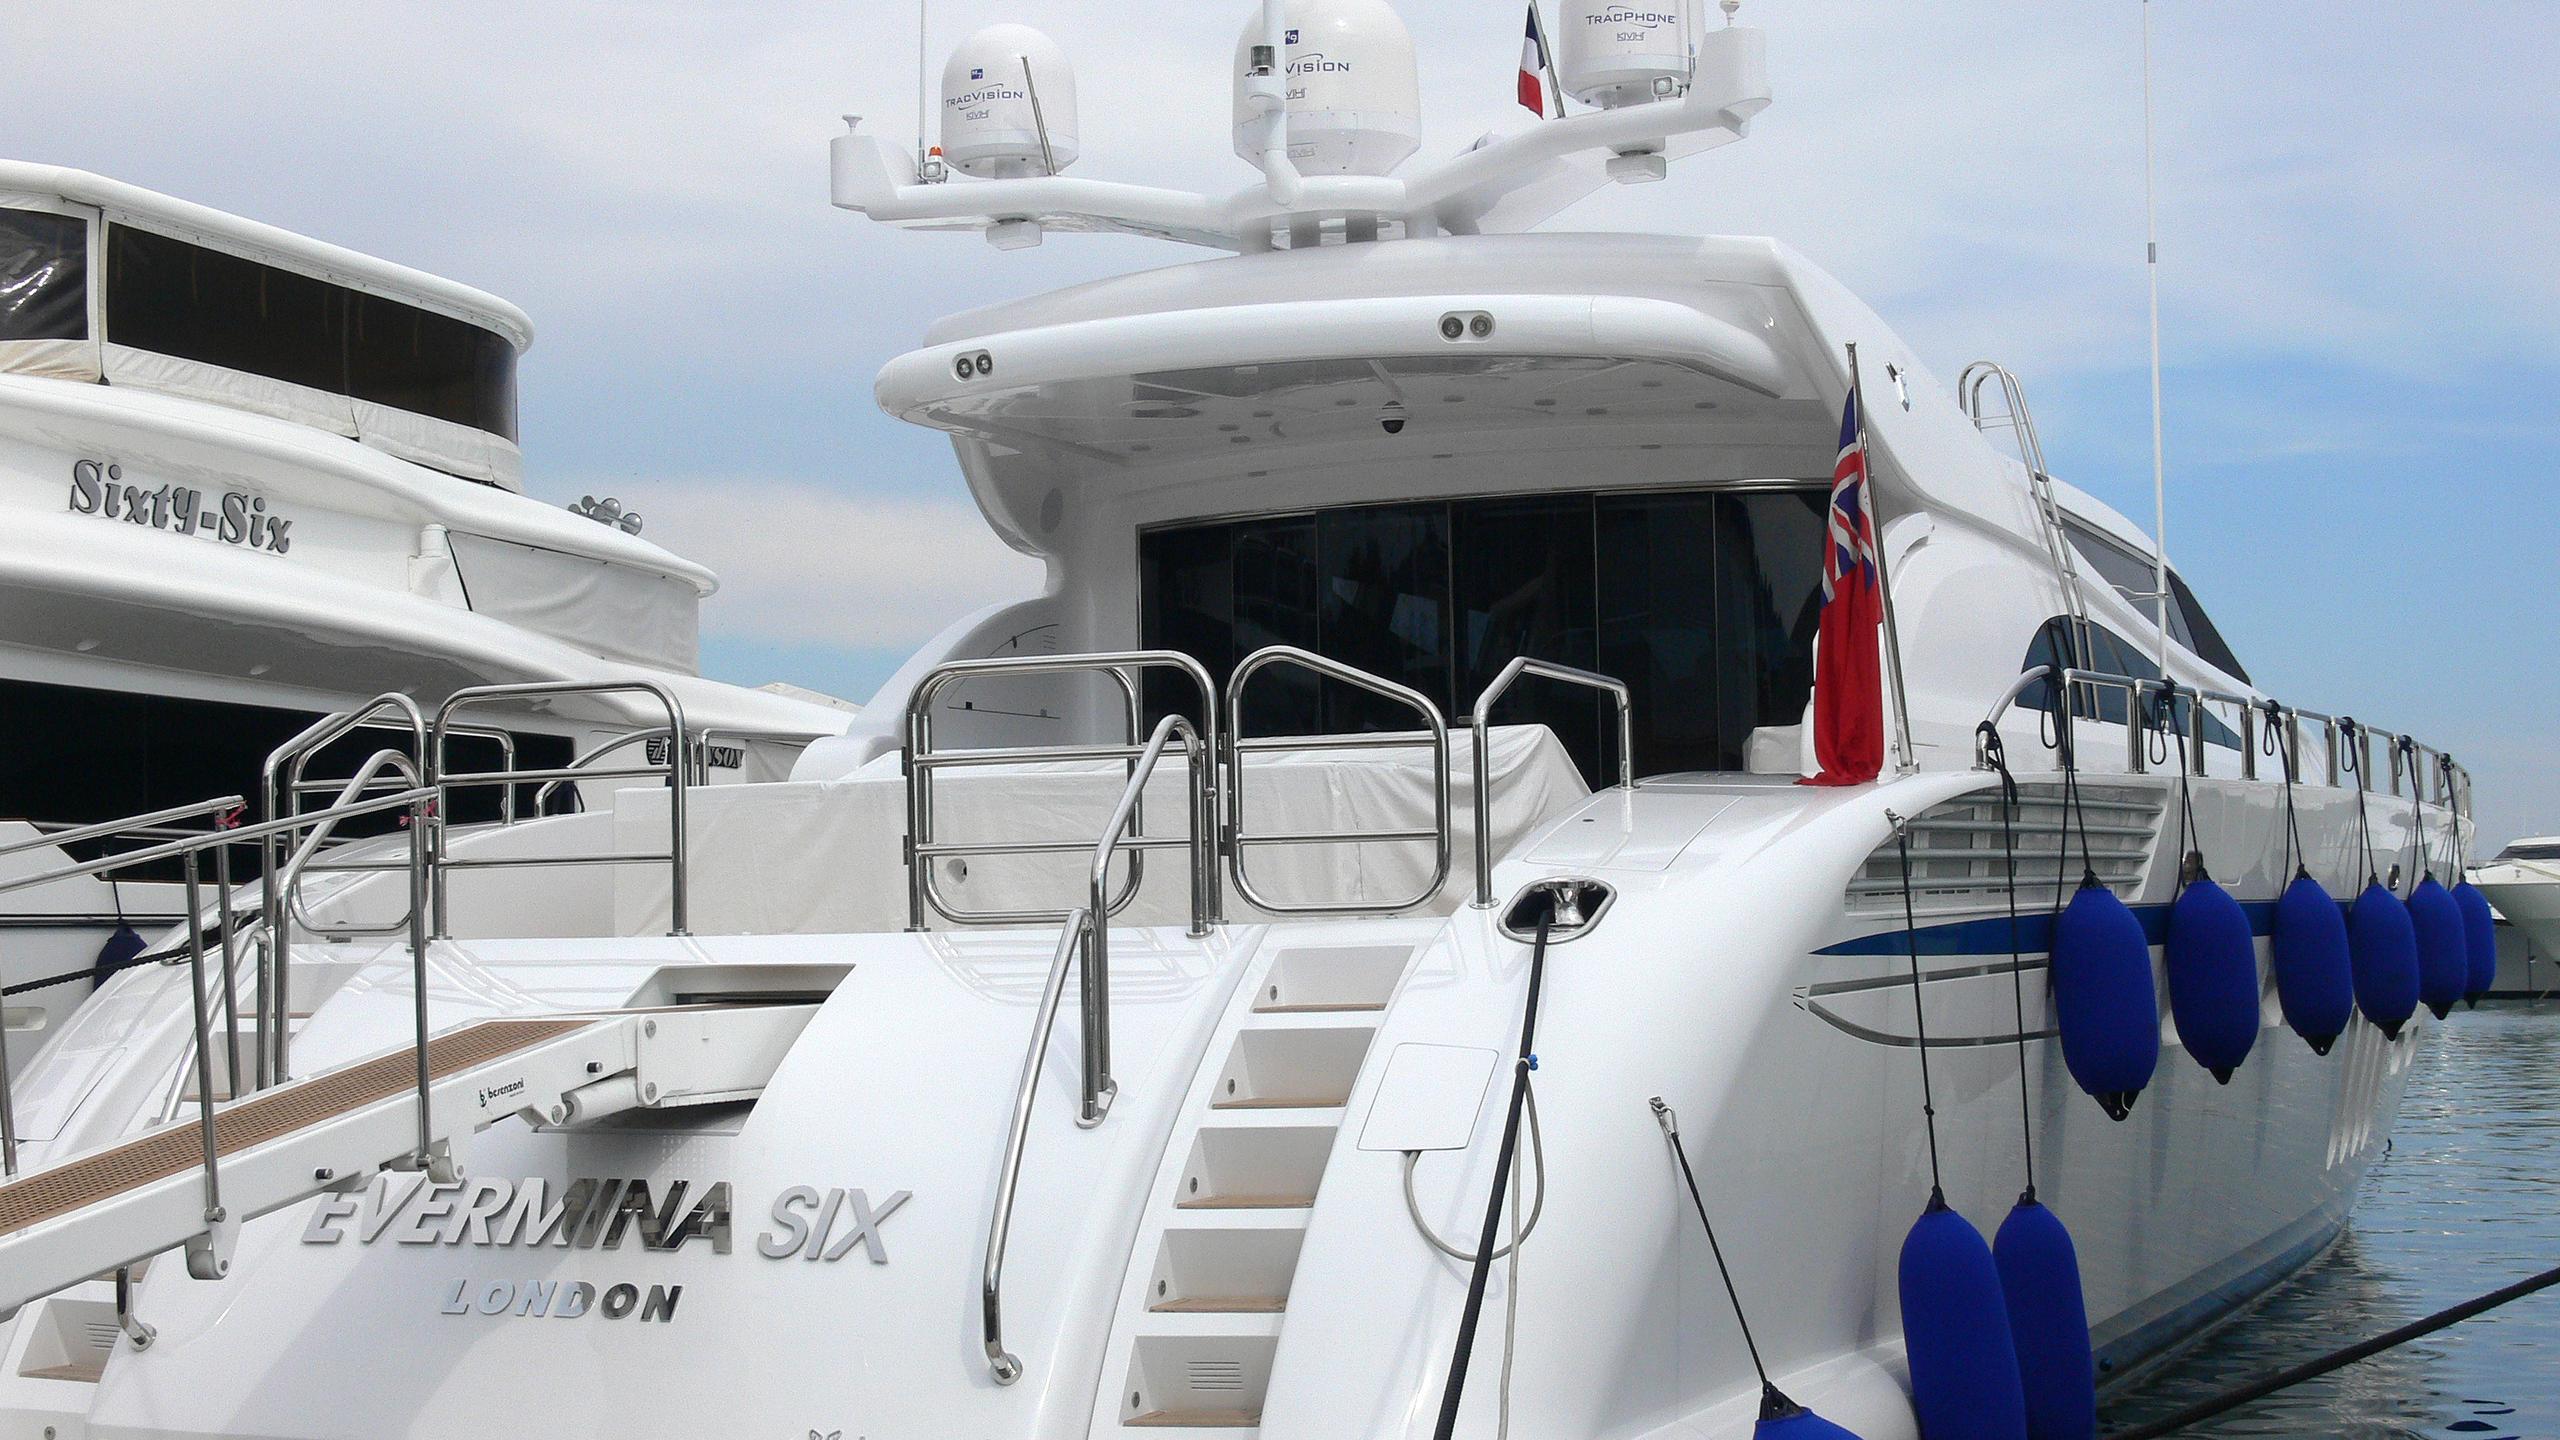 evermina-six-yacht-exterior